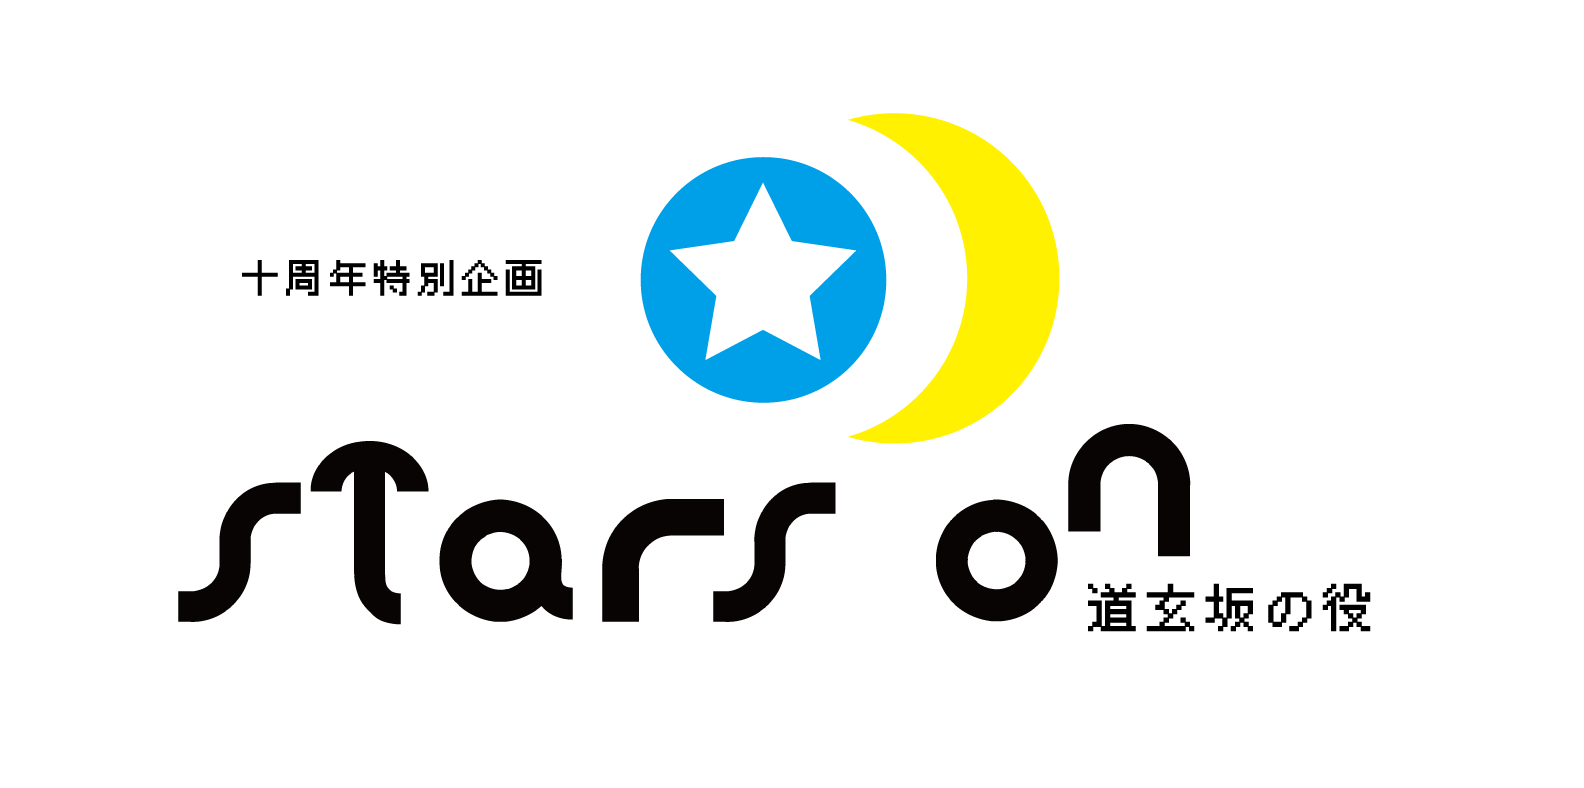 STARS ON 10周年特別企画 道玄坂の役